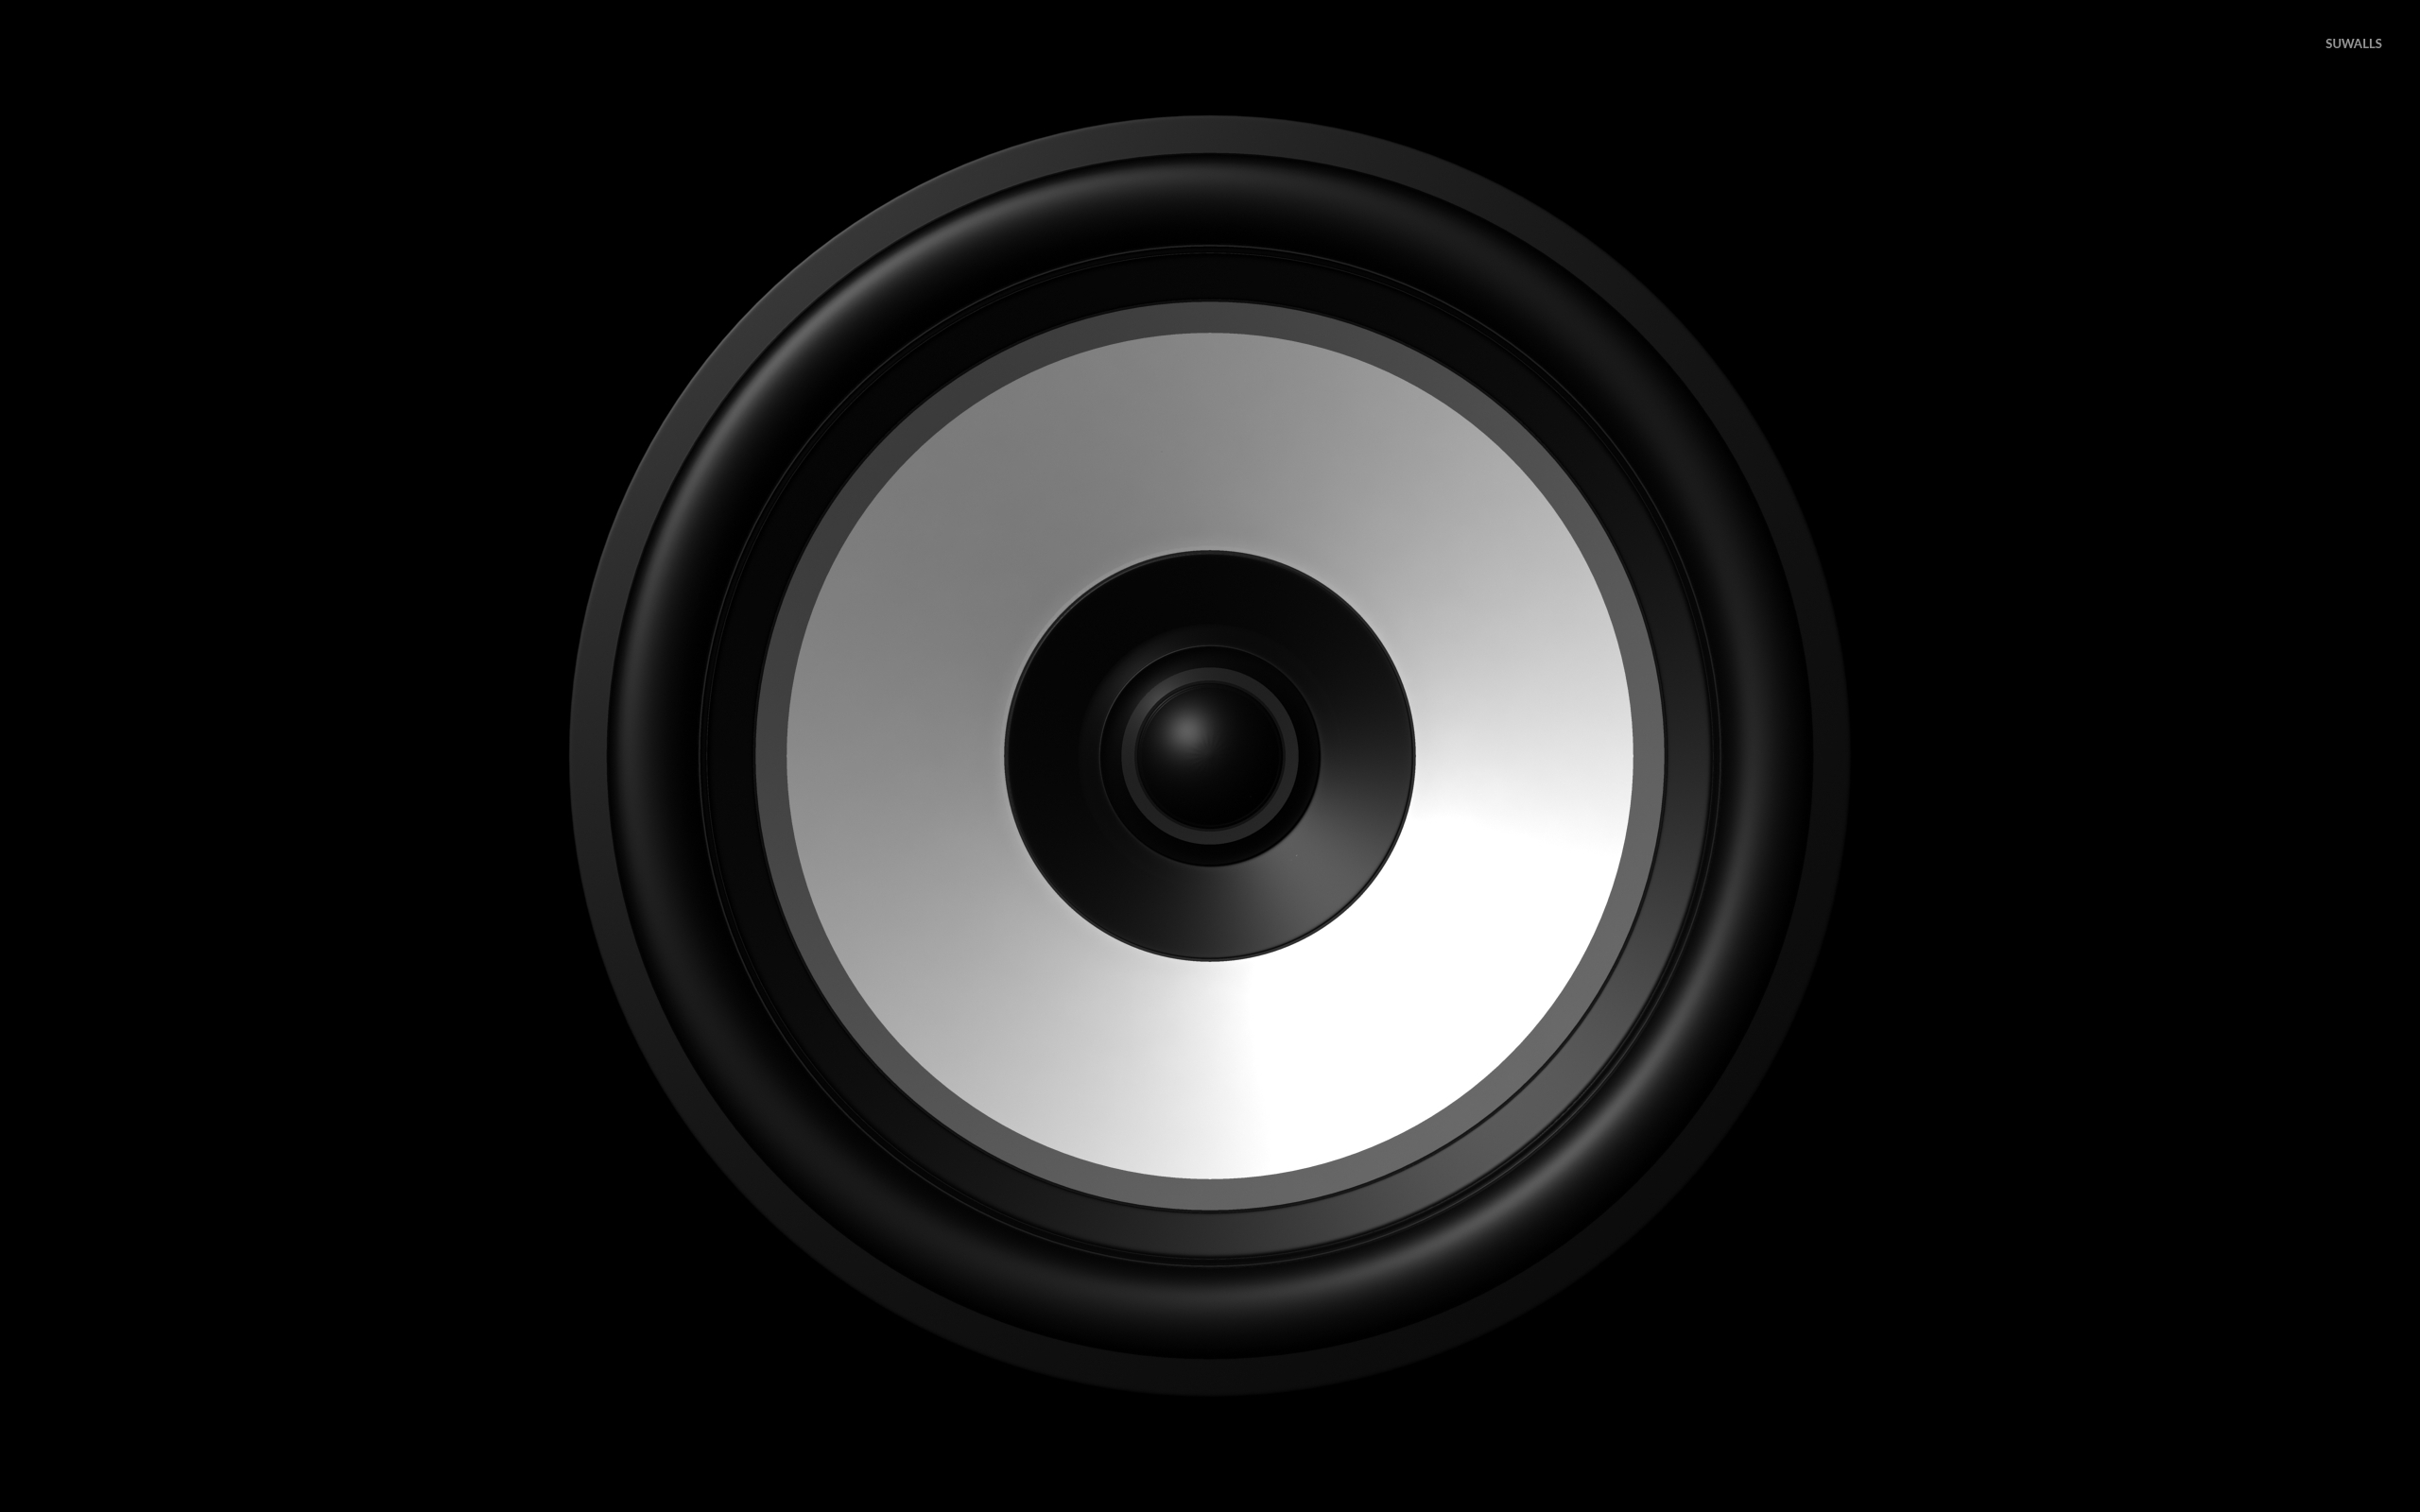 speaker  2  wallpaper - digital art wallpapers